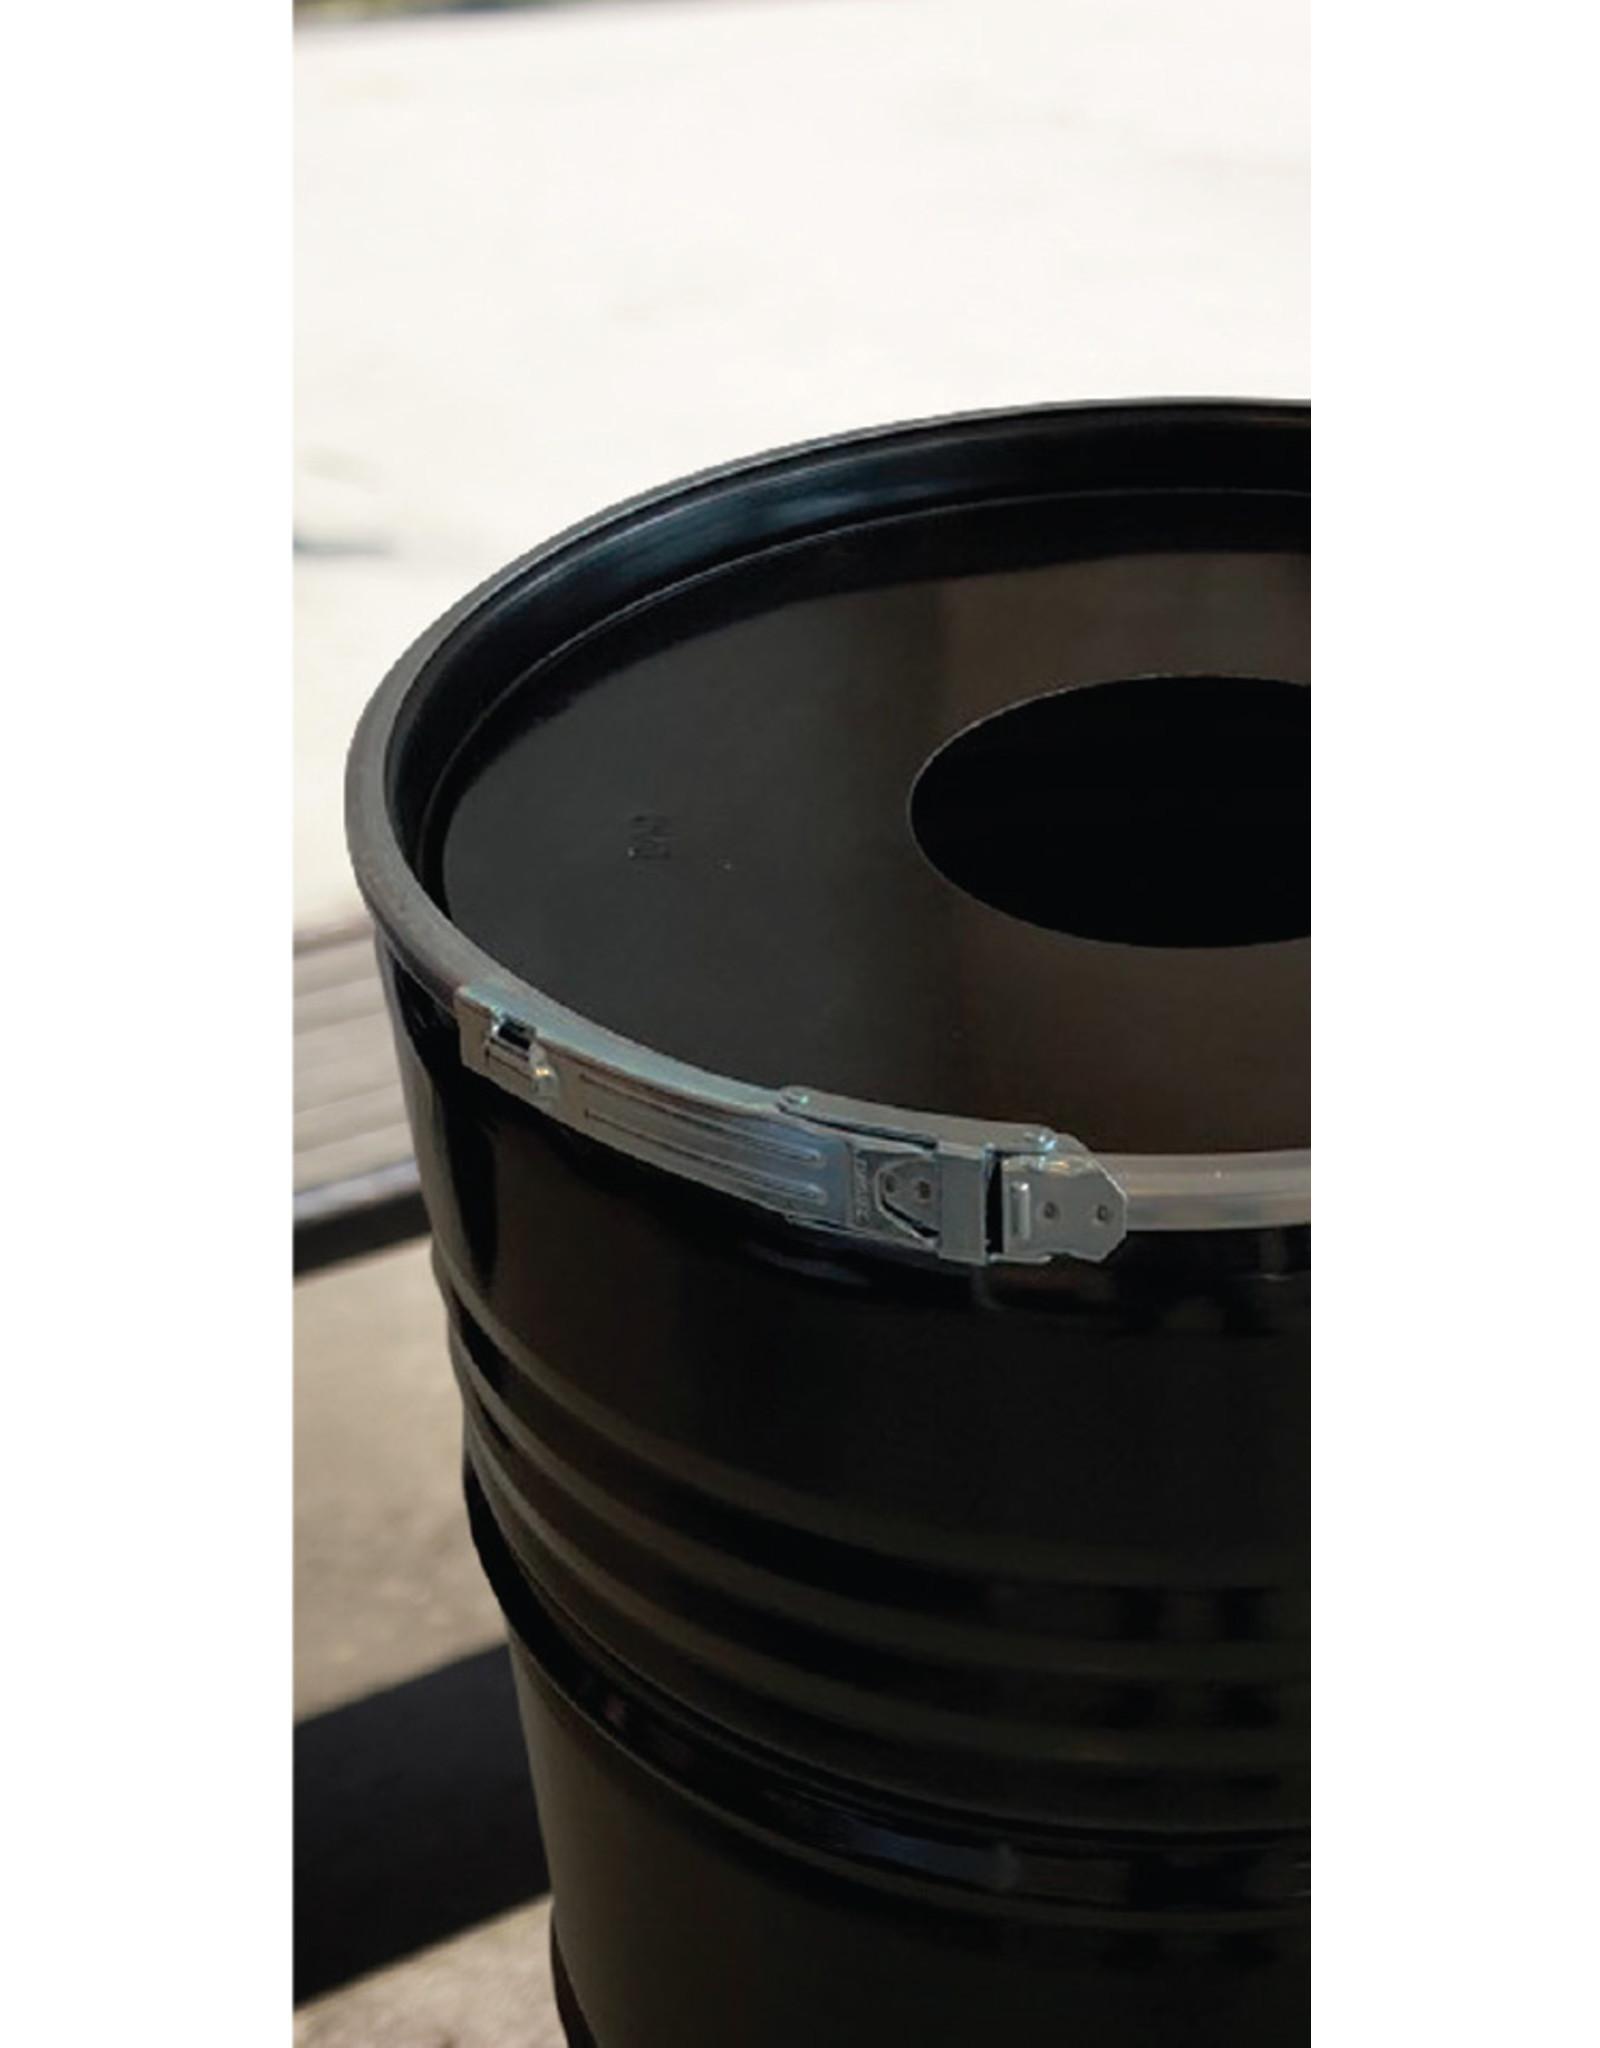 BinBin BinBin Mülleimer mit industriellem Design Schwarz 200 Liter incl. Ausfräsung